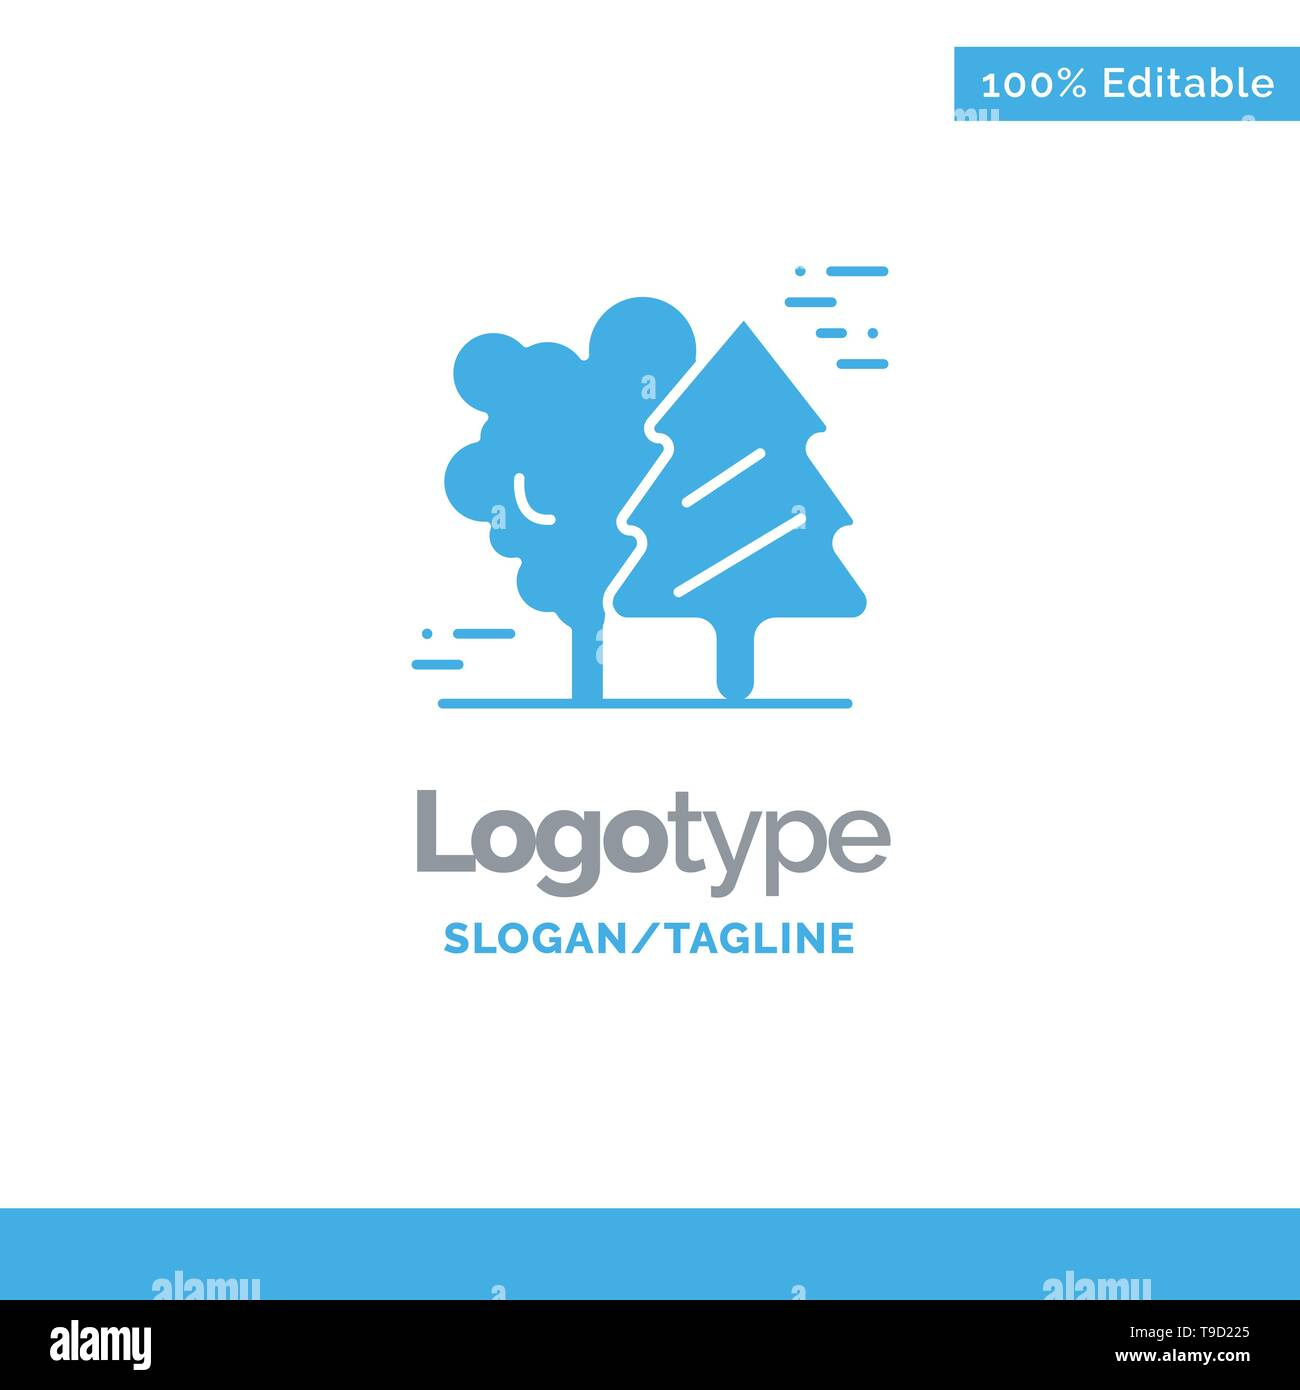 Alpine, Arctic, Canada, Pine Trees, Scandinavia Blue Solid Logo Template. Place for Tagline - Stock Image